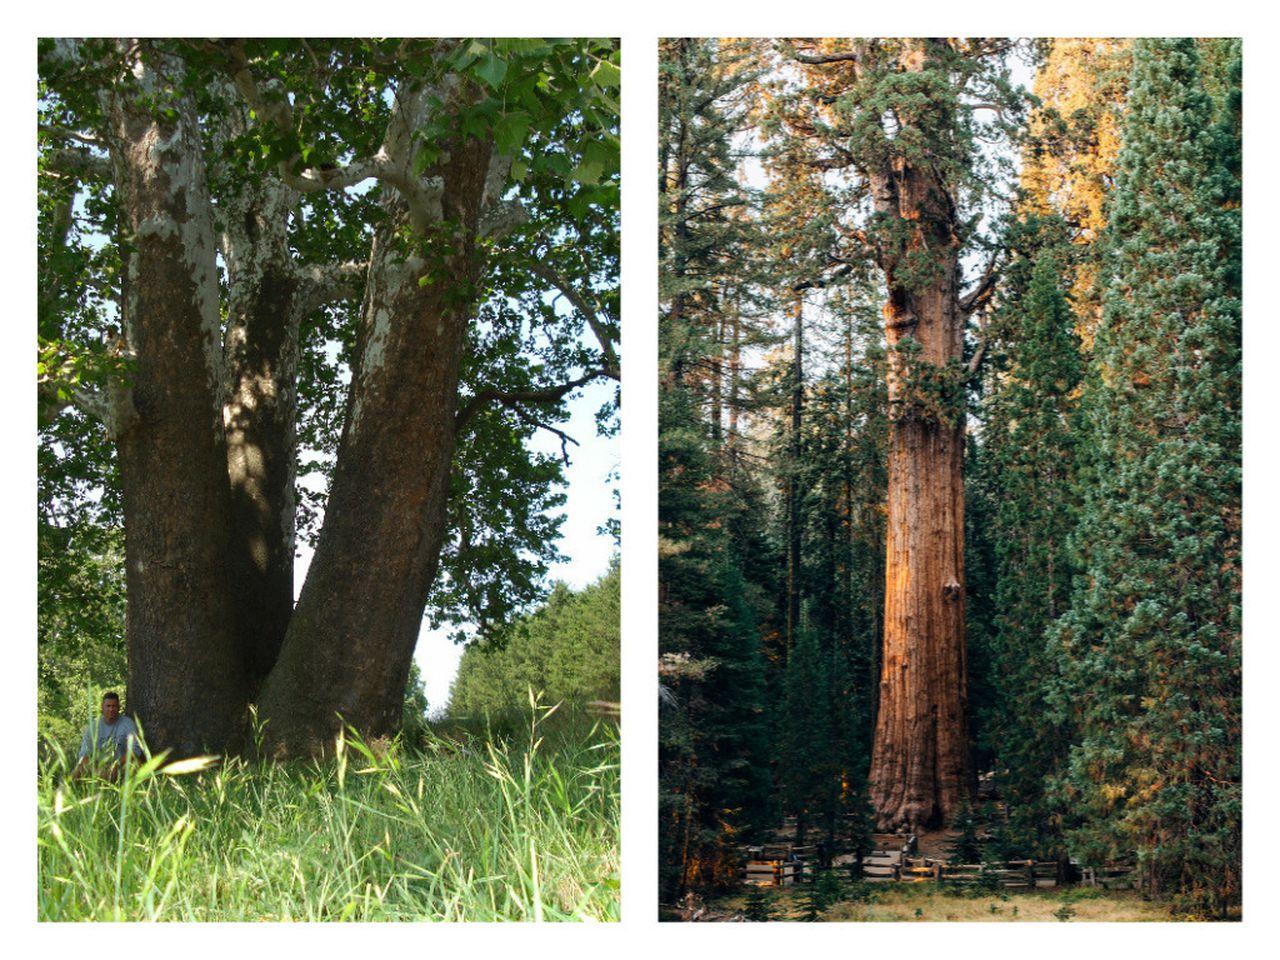 West Laurel Hill Cemetery Arborist Coordinating Pennsylvania's Champion Trees Program